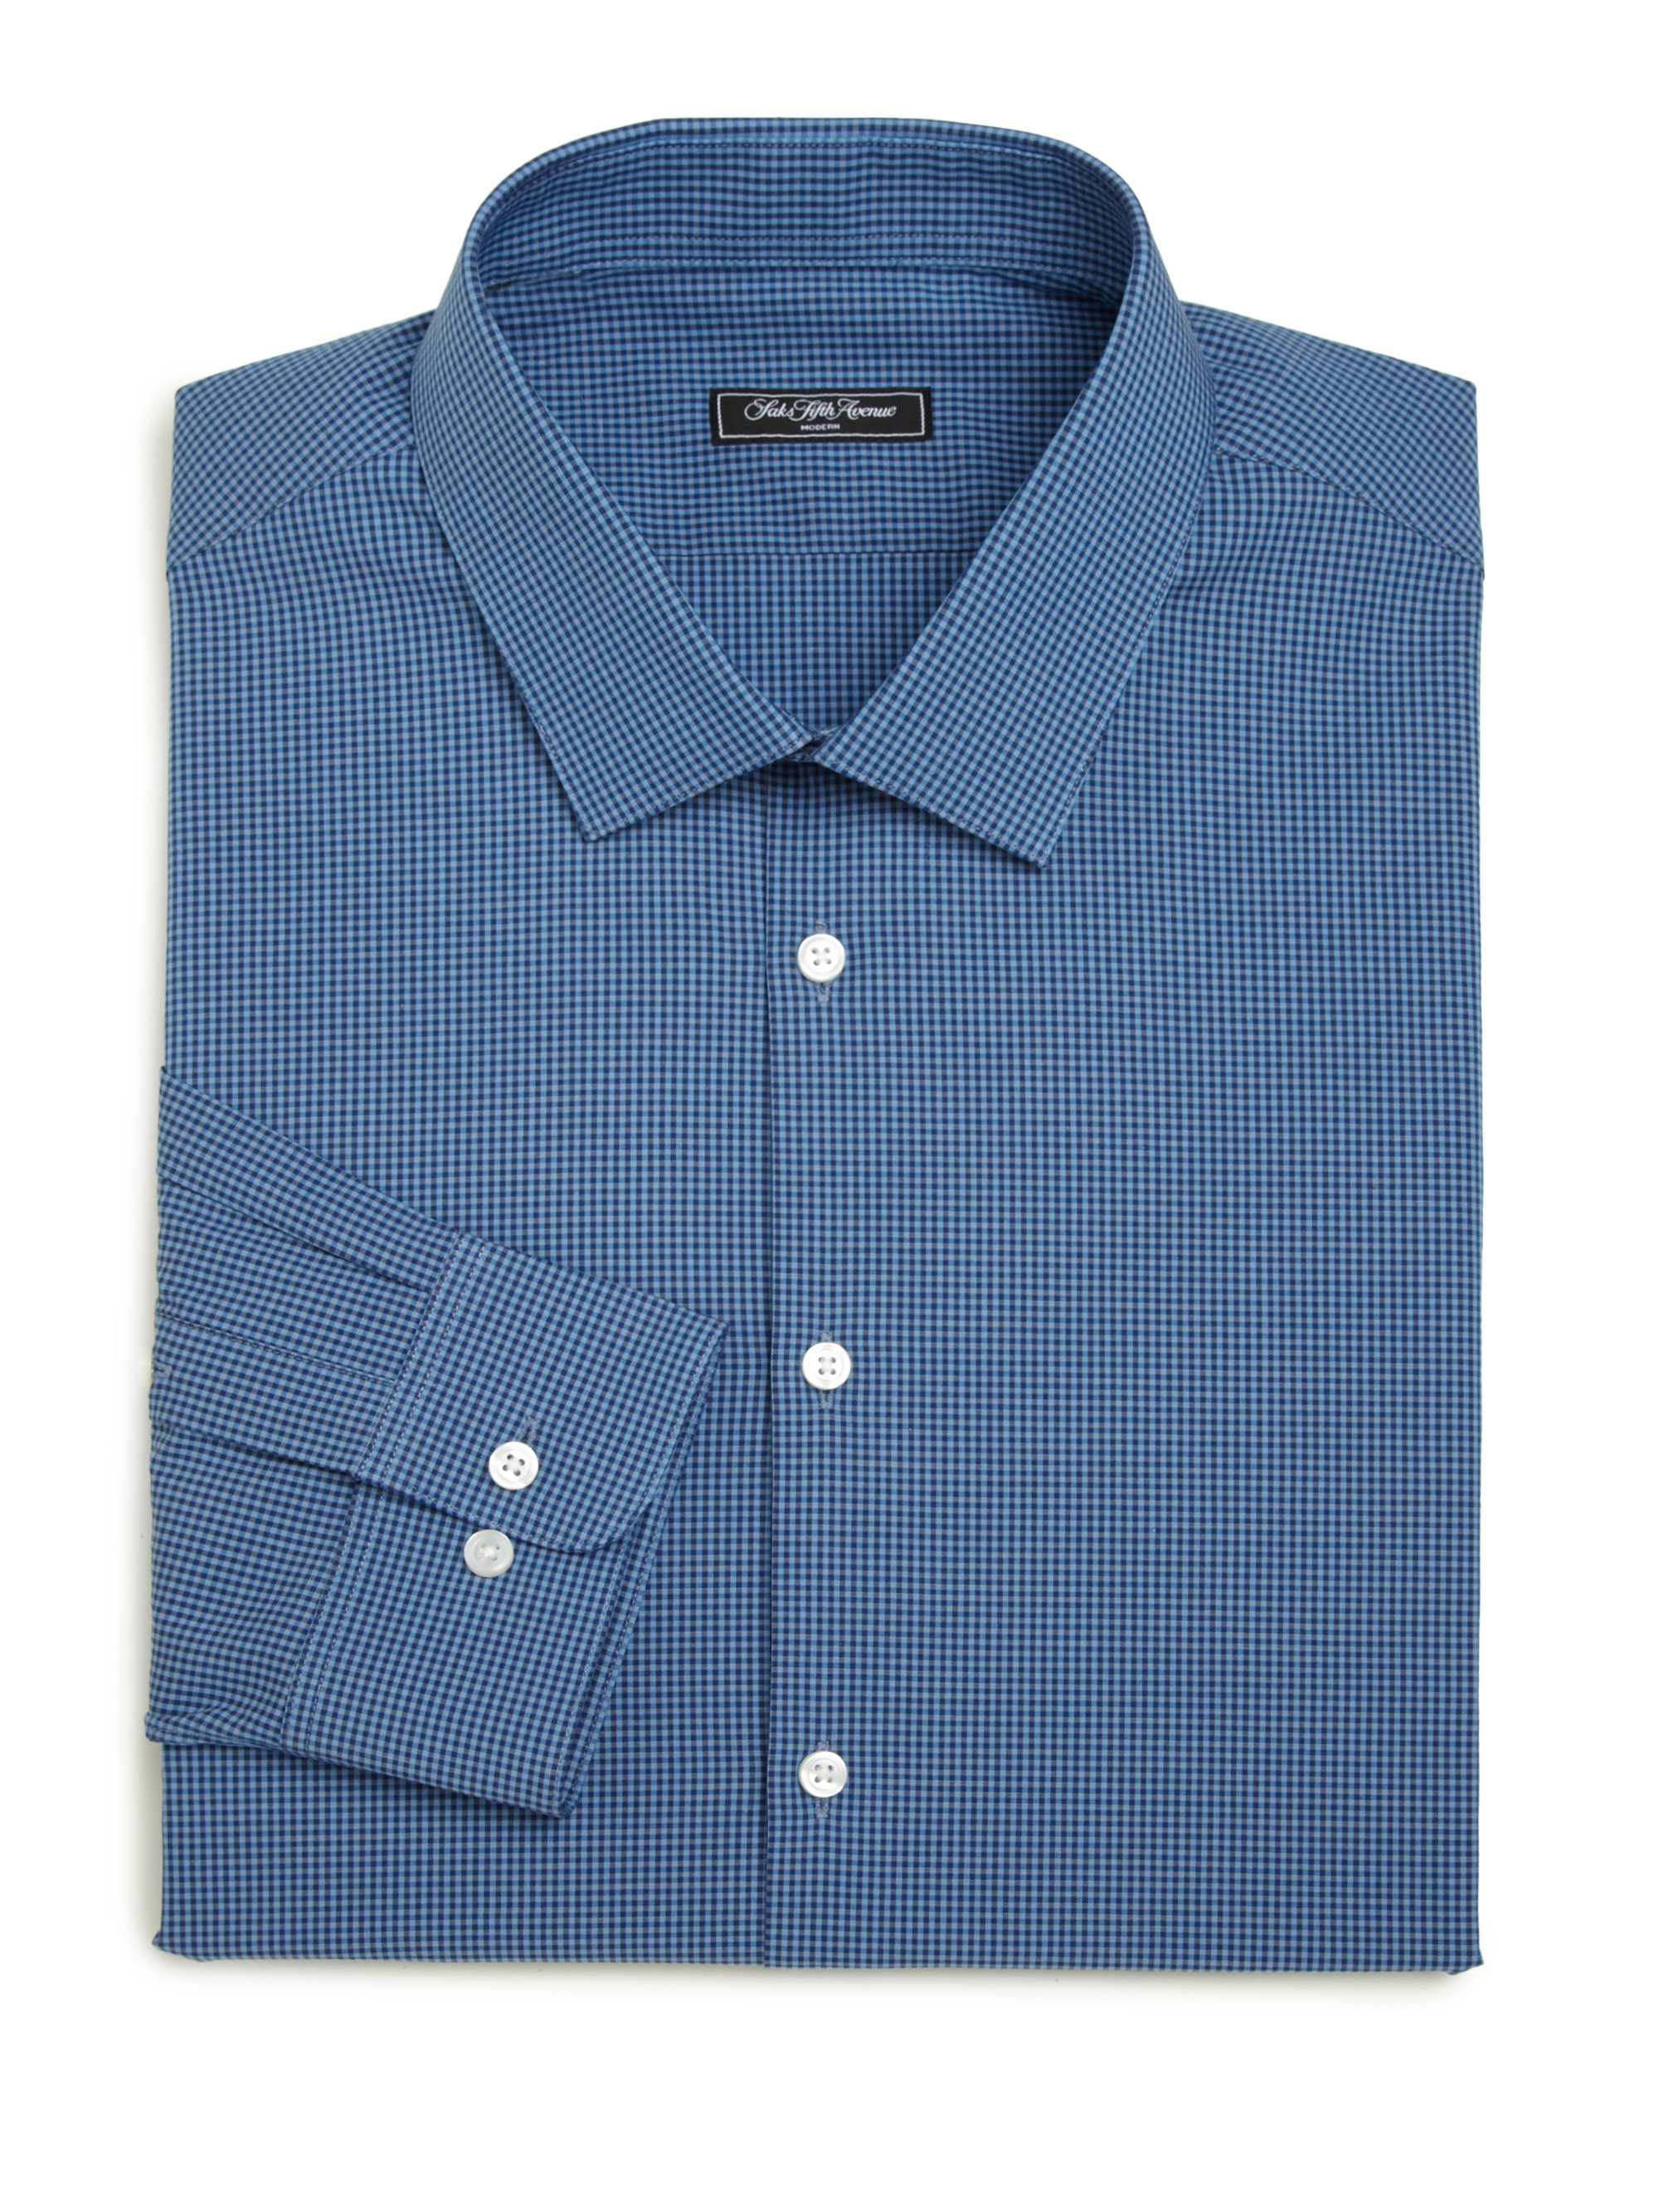 Saks fifth avenue modern fit printed dress shirt in blue for Modern fit dress shirt